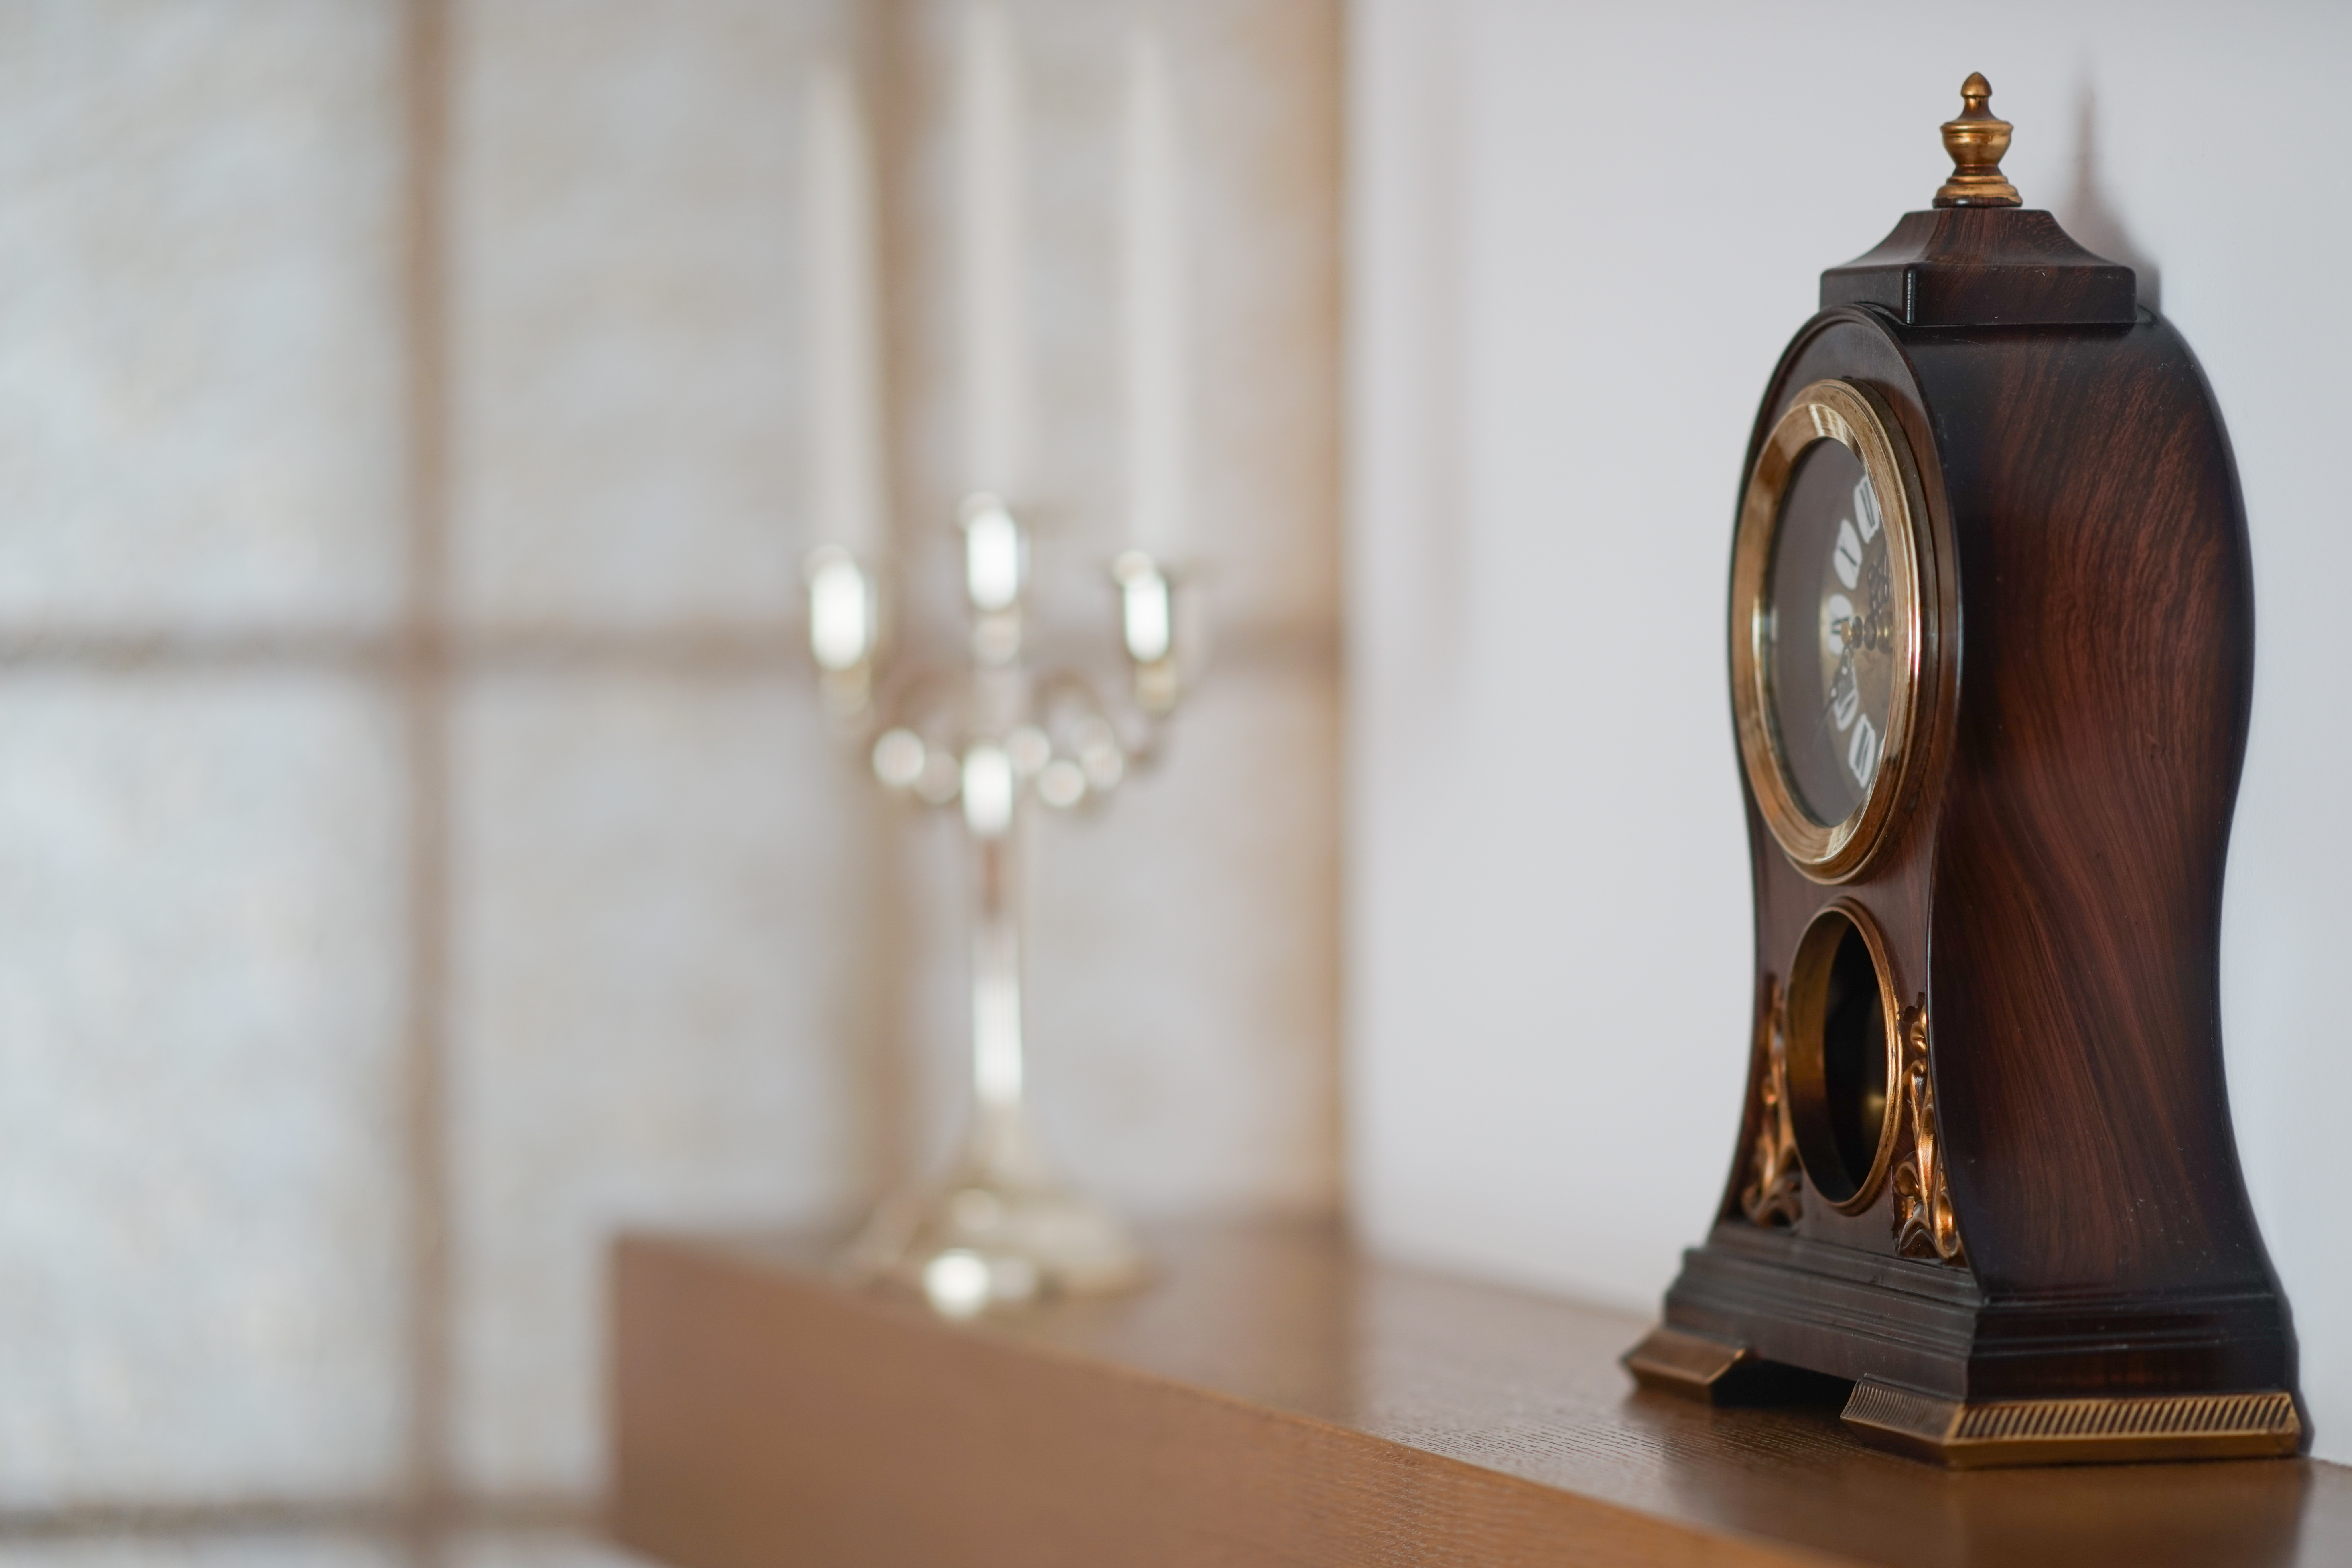 Old american mantel clocks